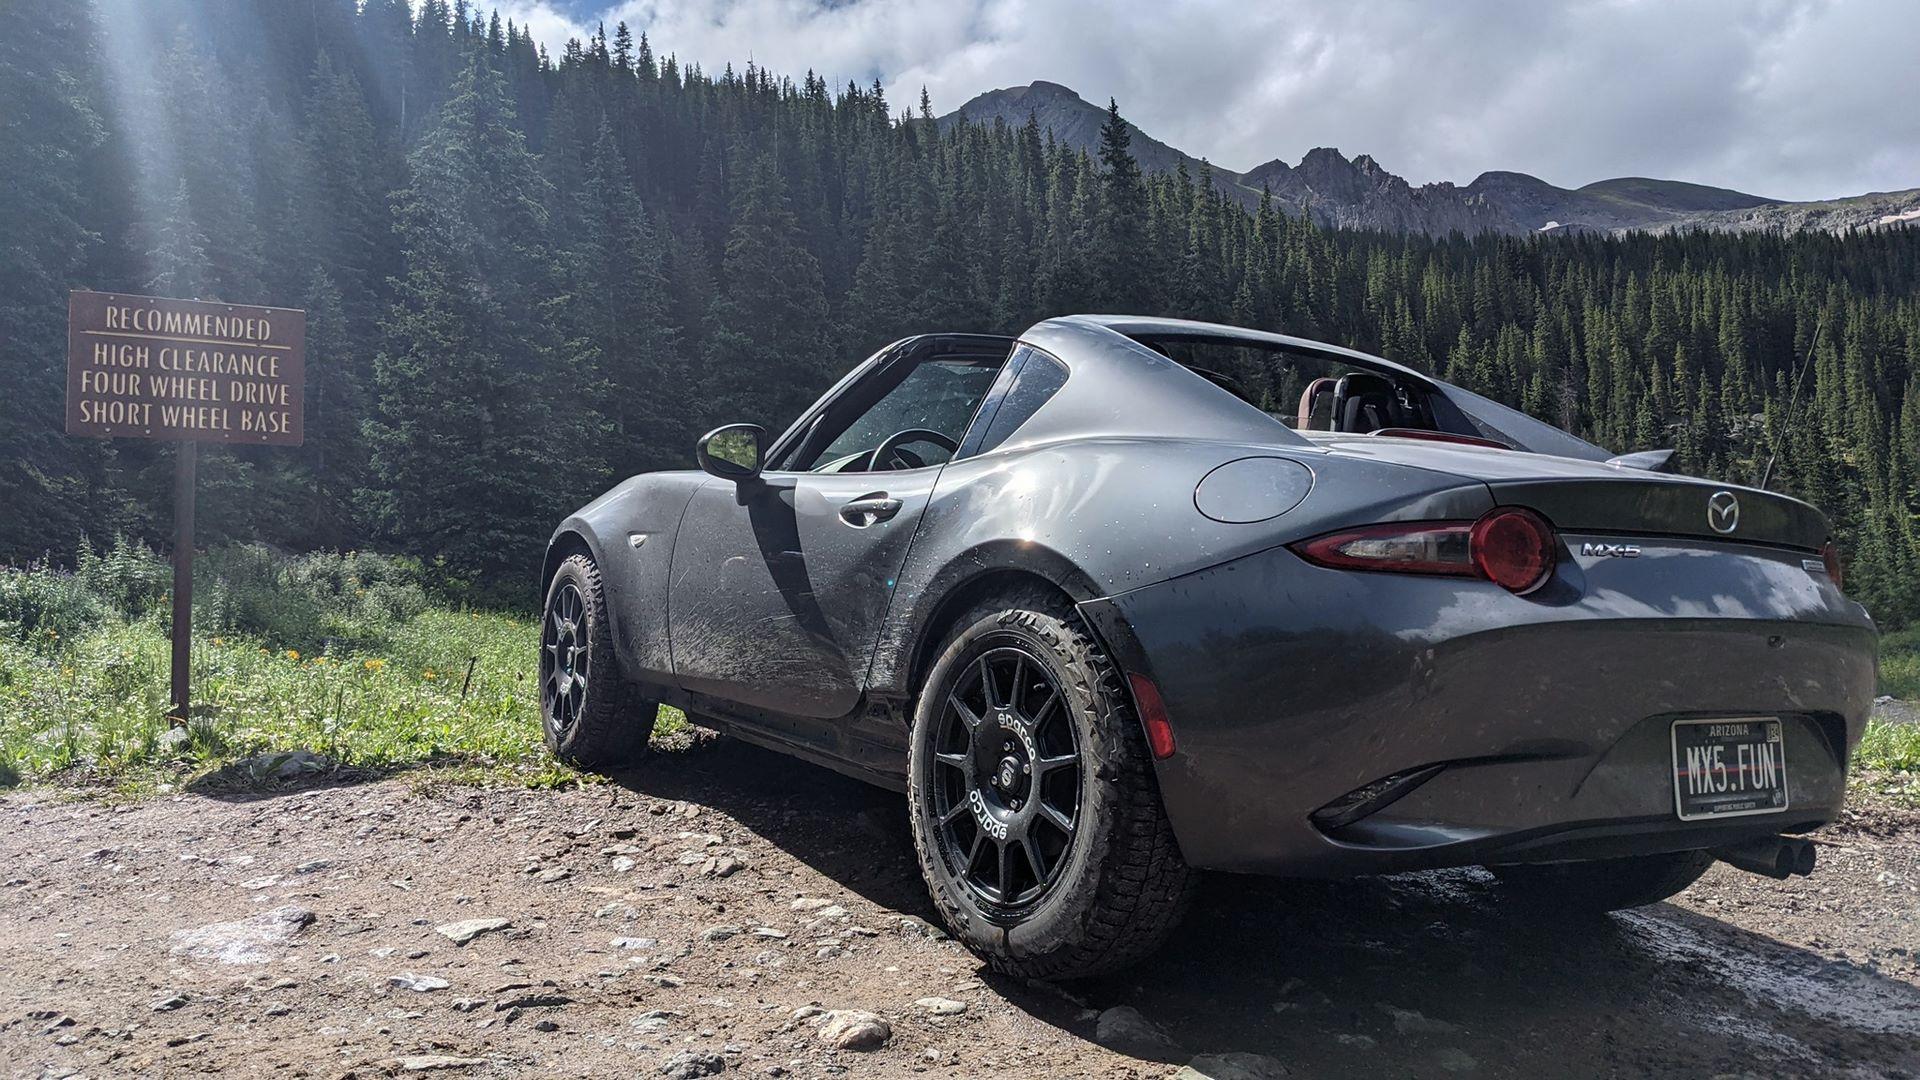 Mazda-MX-5-RF-off-road-1